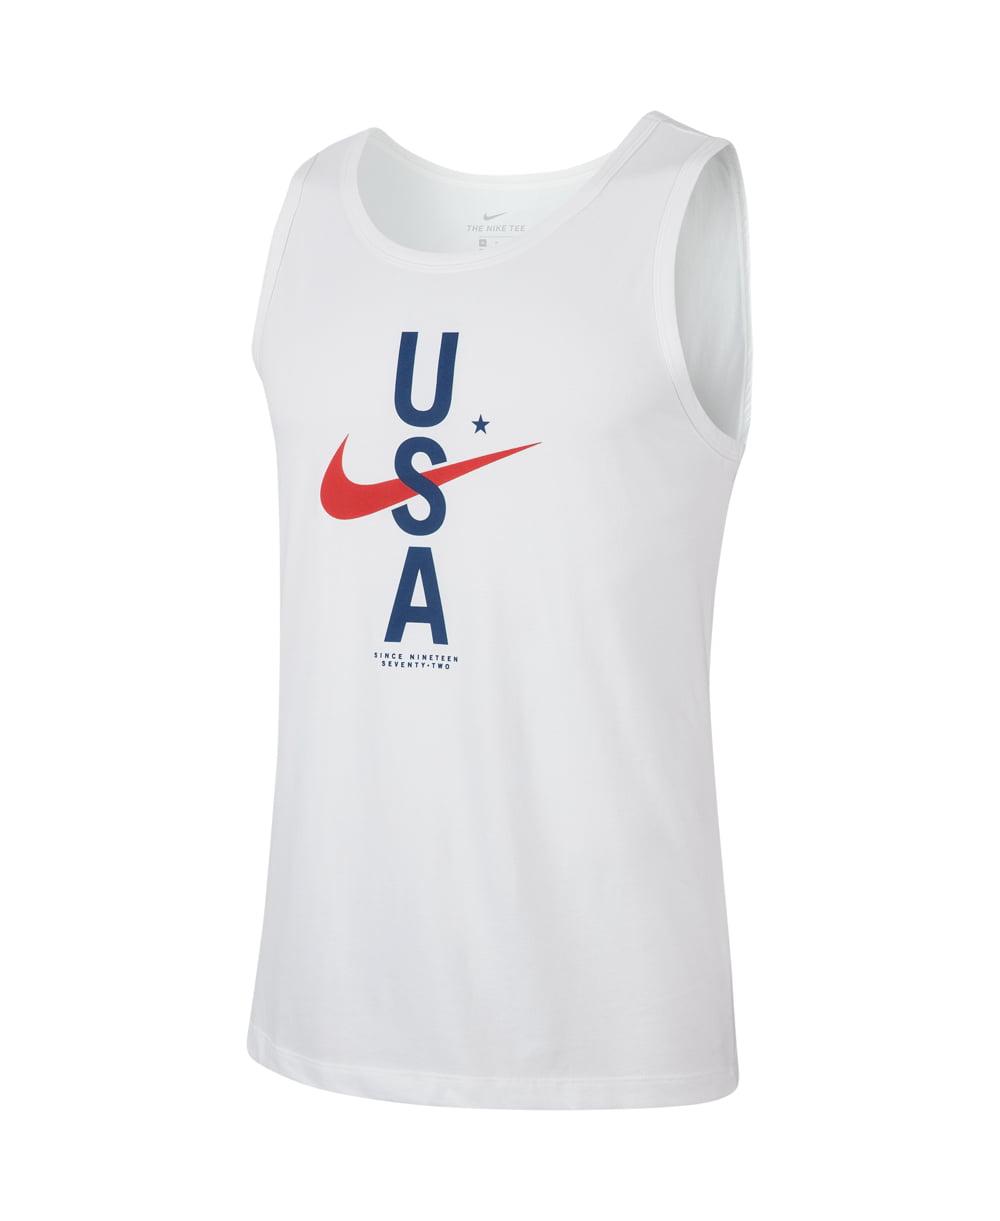 Air Force Headquarters Georgia Air National Guard Mens Printed Vest Sports Tank-Top Tee Leisure Shirts Sleeveless Shirts